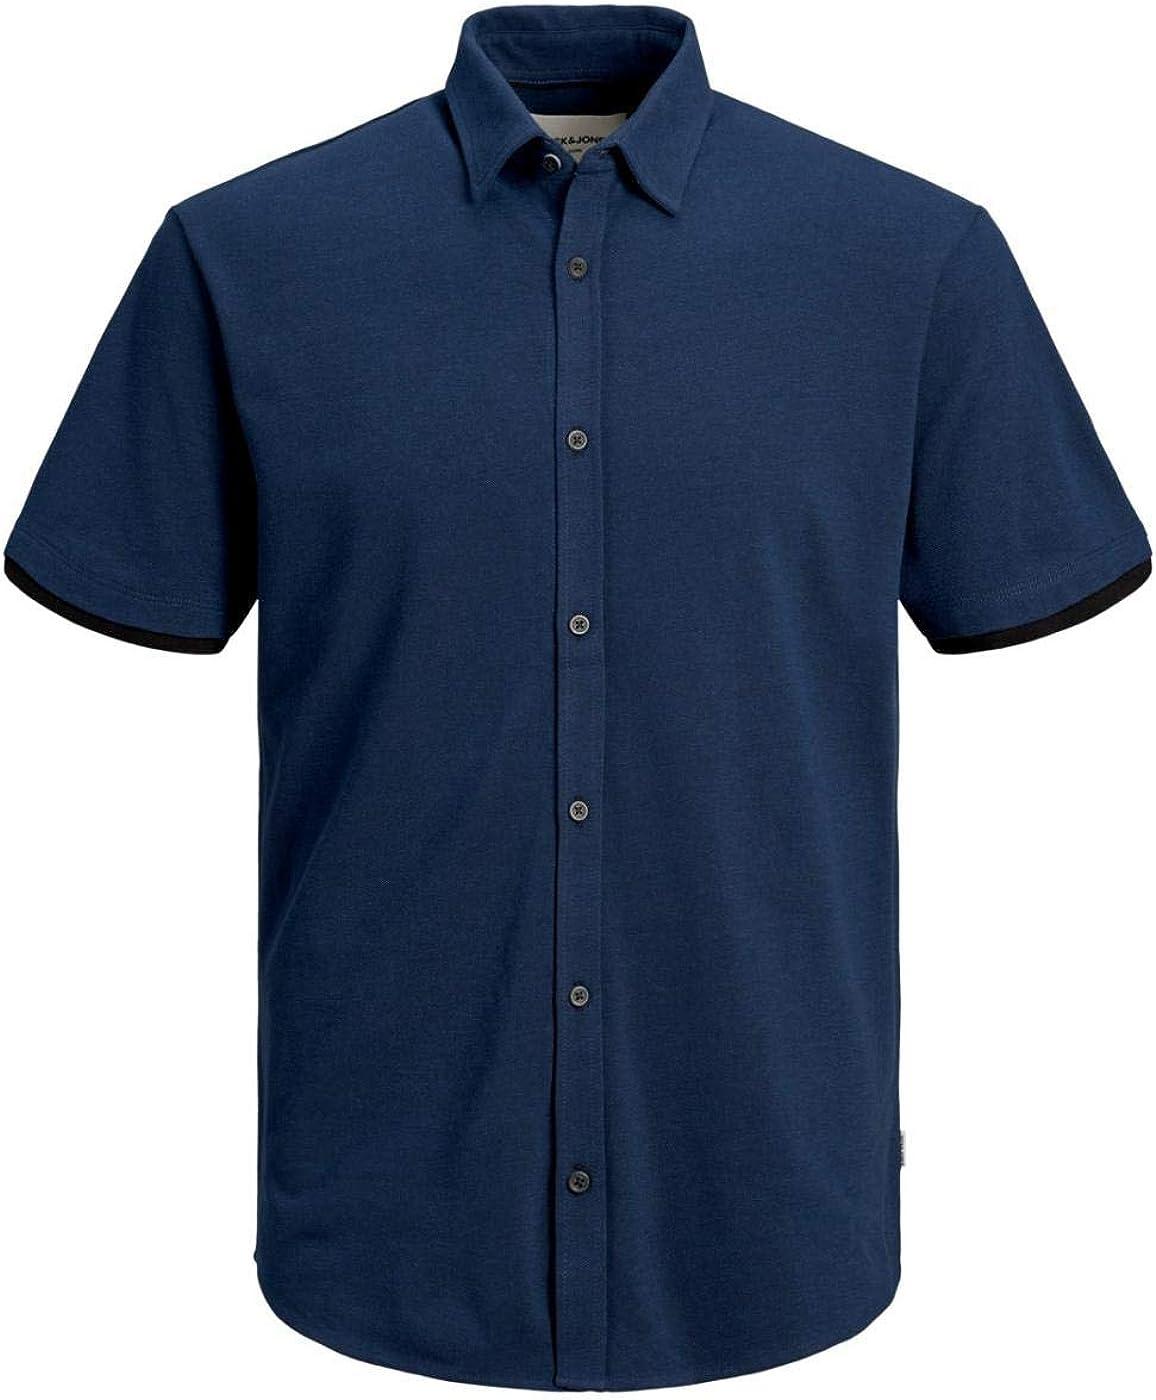 Jack & Jones JCOMERCURY Shirt SS Plain Chinese-W S: Amazon.es ...